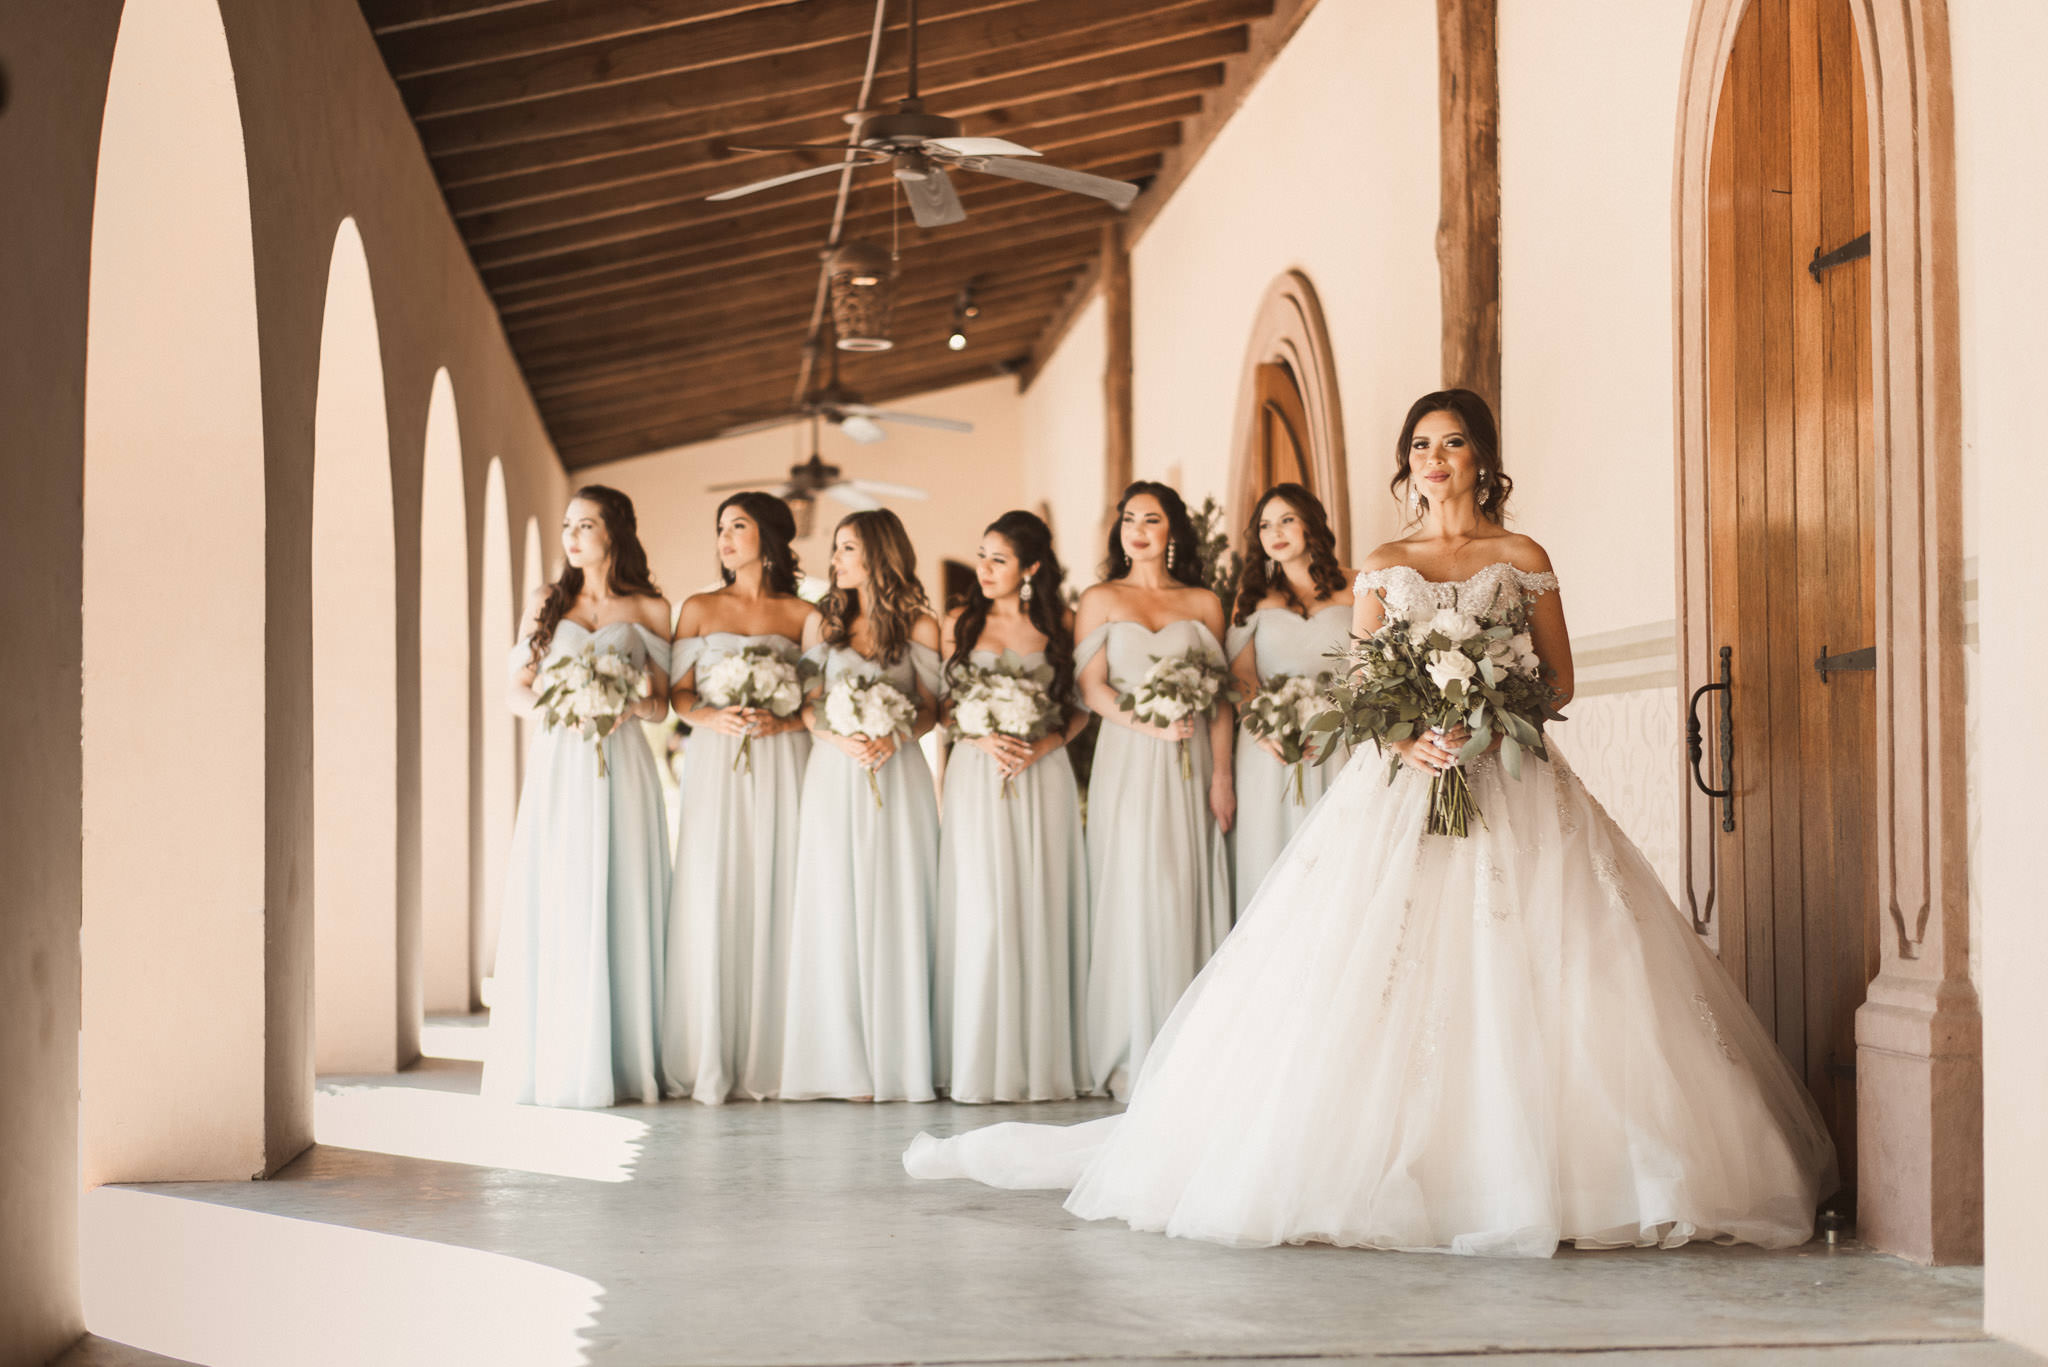 adriana-christian-wedding-re-sm-52.jpg